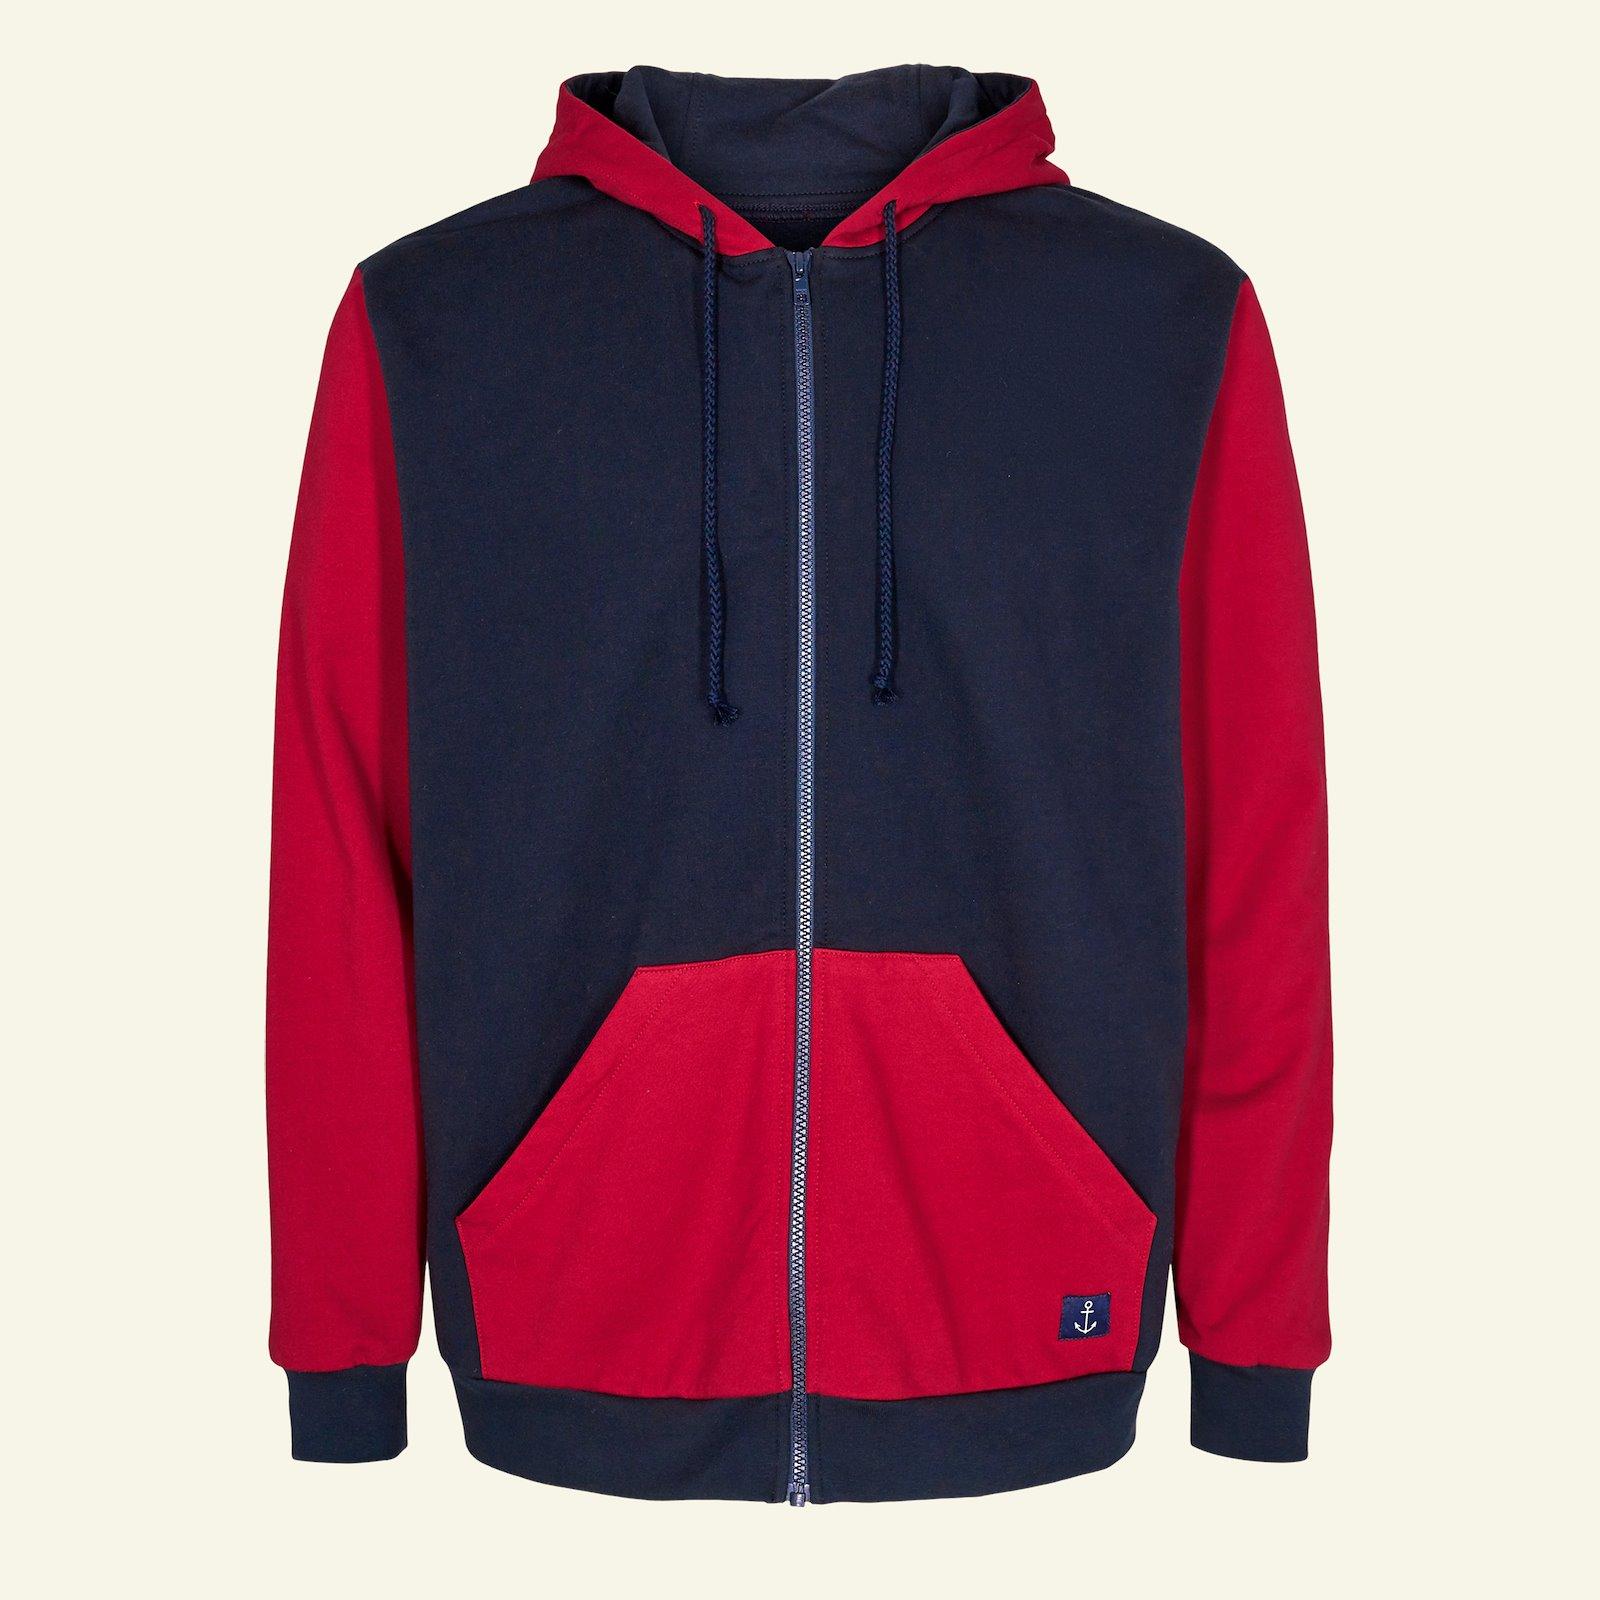 Sweatshirt og sweatpants, S p86001_211750_211756_230639_26544_sskit